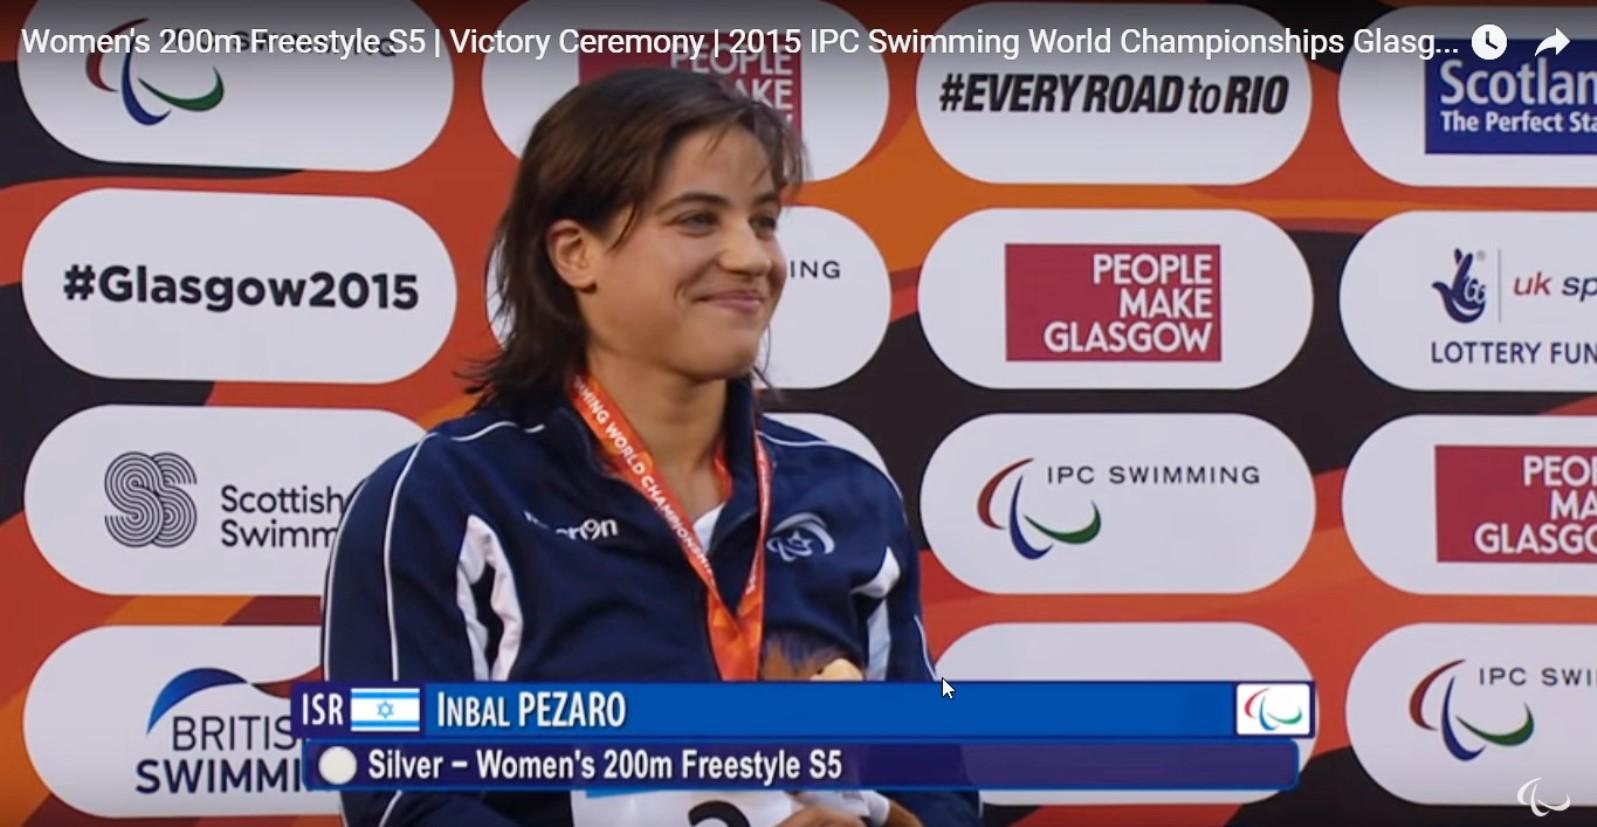 Inbal Pezaro on the podium at the 2015 World Swimming Championship in Glasgow. Photo: screenshot